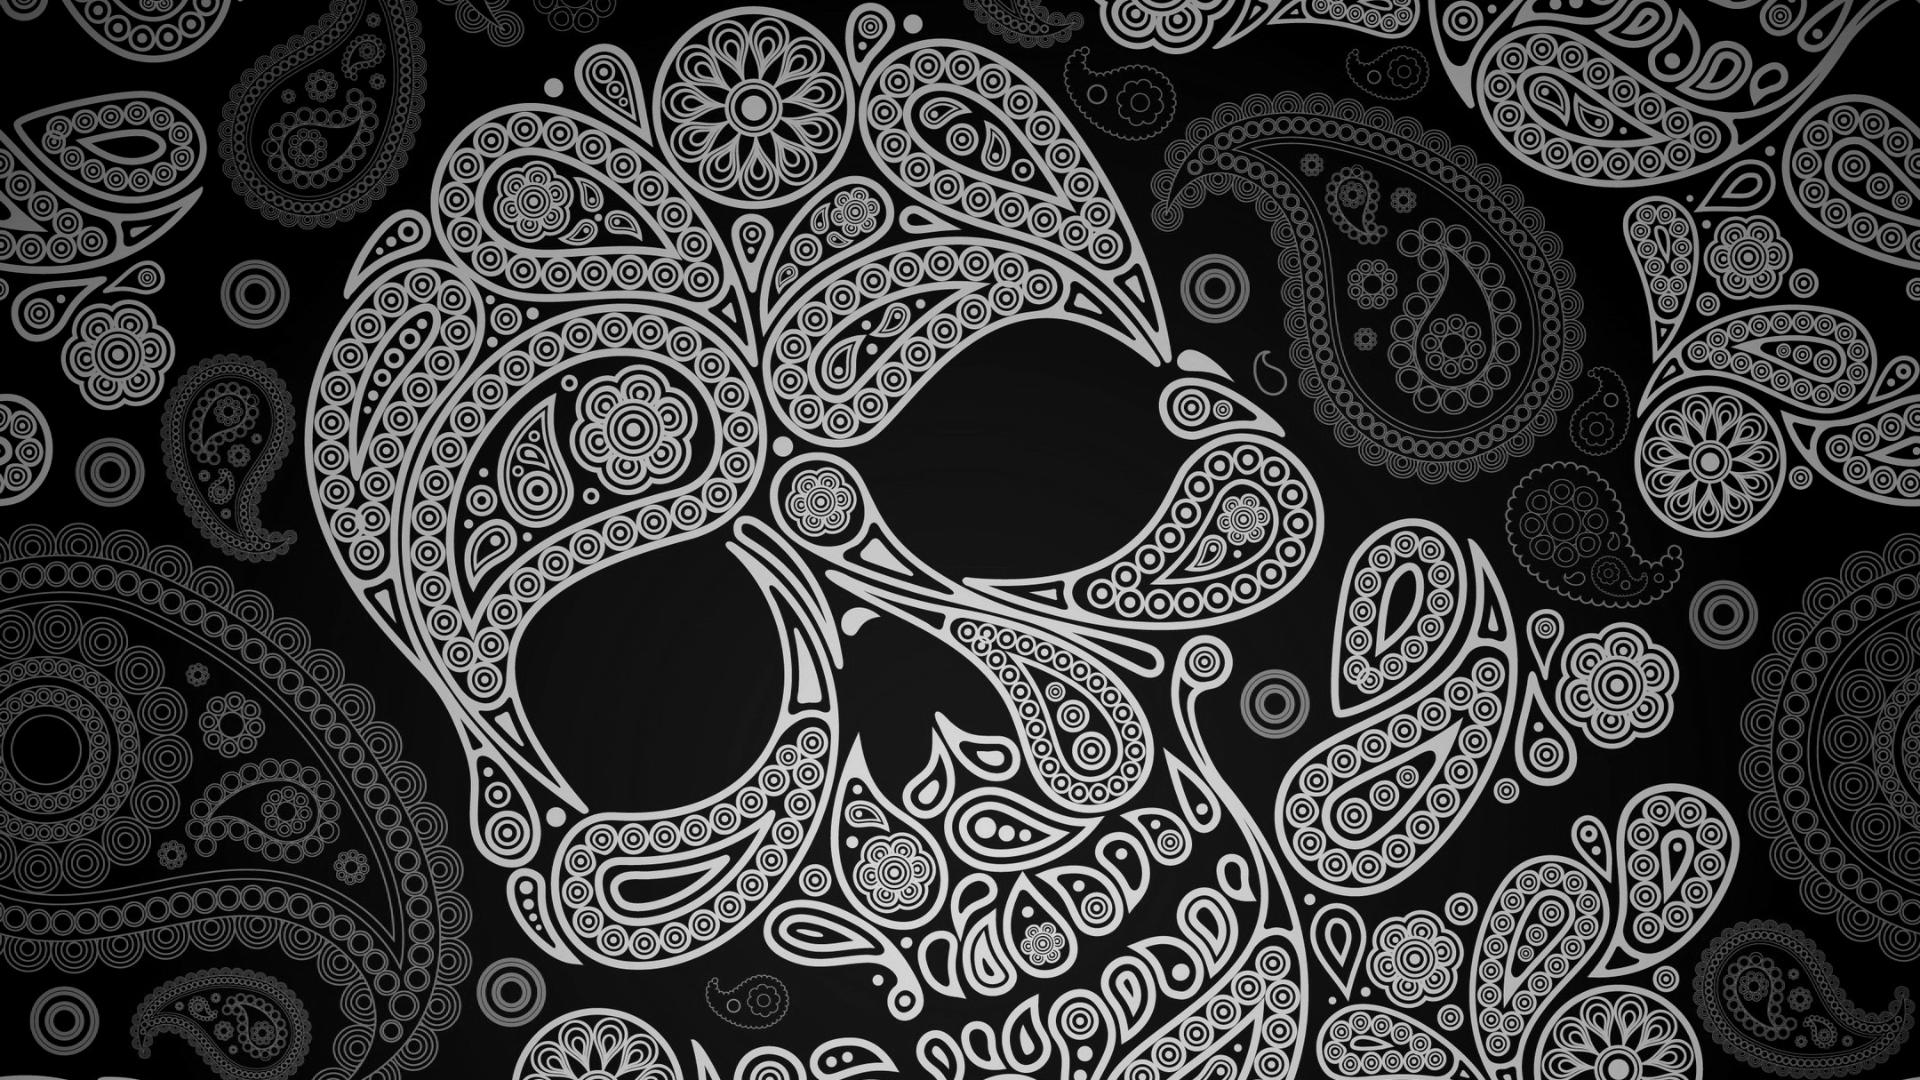 sugar skull wallpapers wallpapersafari. Black Bedroom Furniture Sets. Home Design Ideas